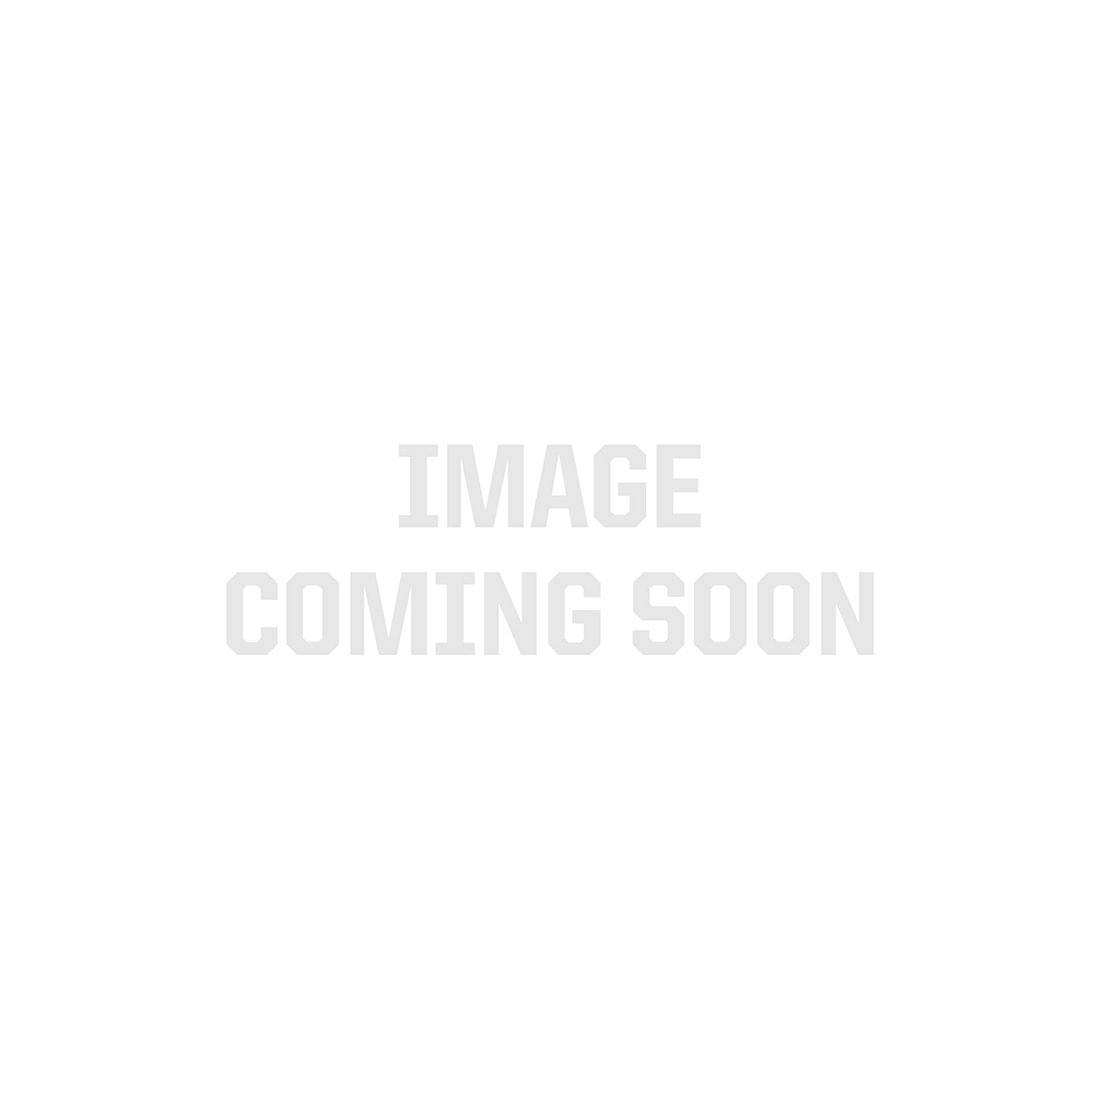 Waterproof Amber 3528 Single Row LED Strip Light, 120/m, 10mm wide, Sample Kit